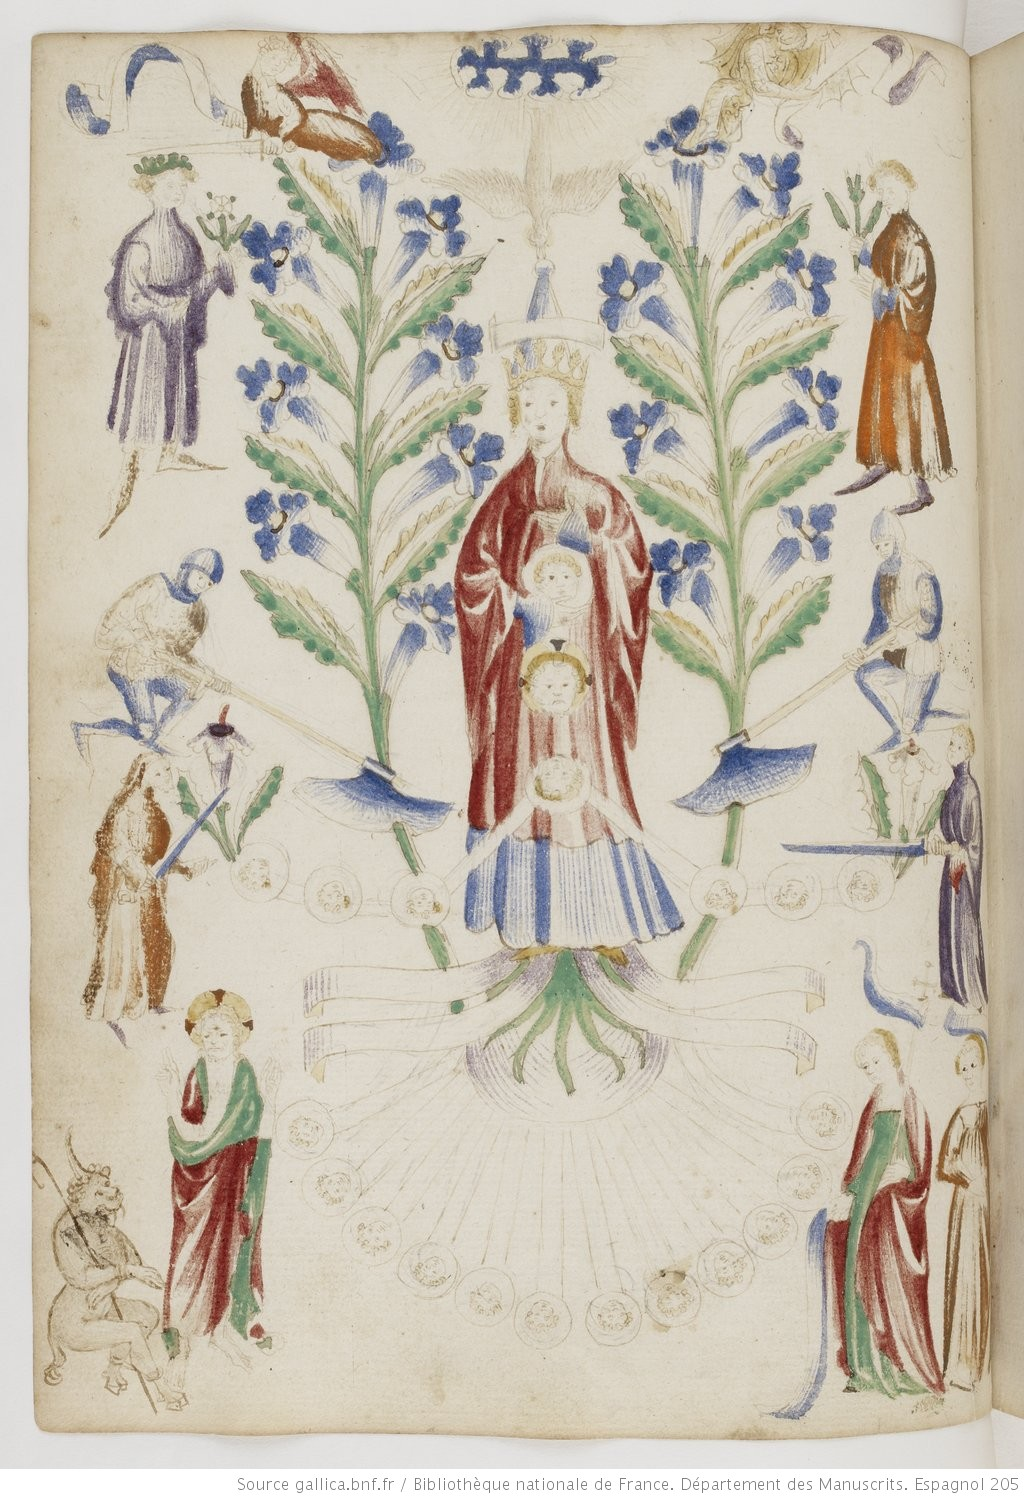 Matfre_Ermengaud_Breviari_d'Amor_folio 7bis v